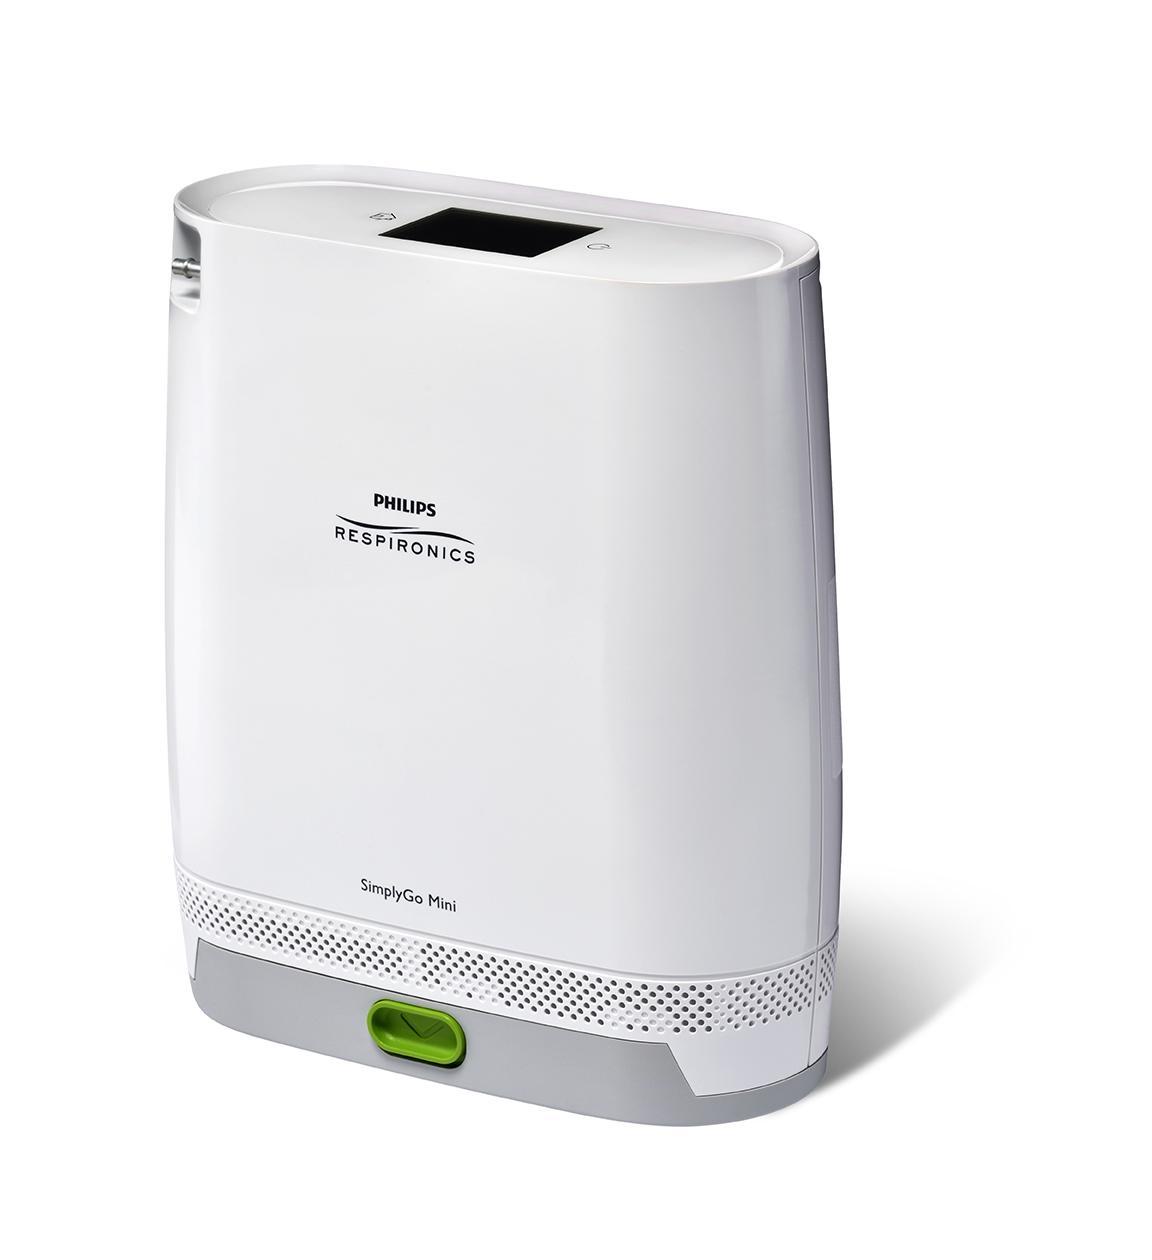 Philips Respironics Simplygo Mini Portable Oxygen